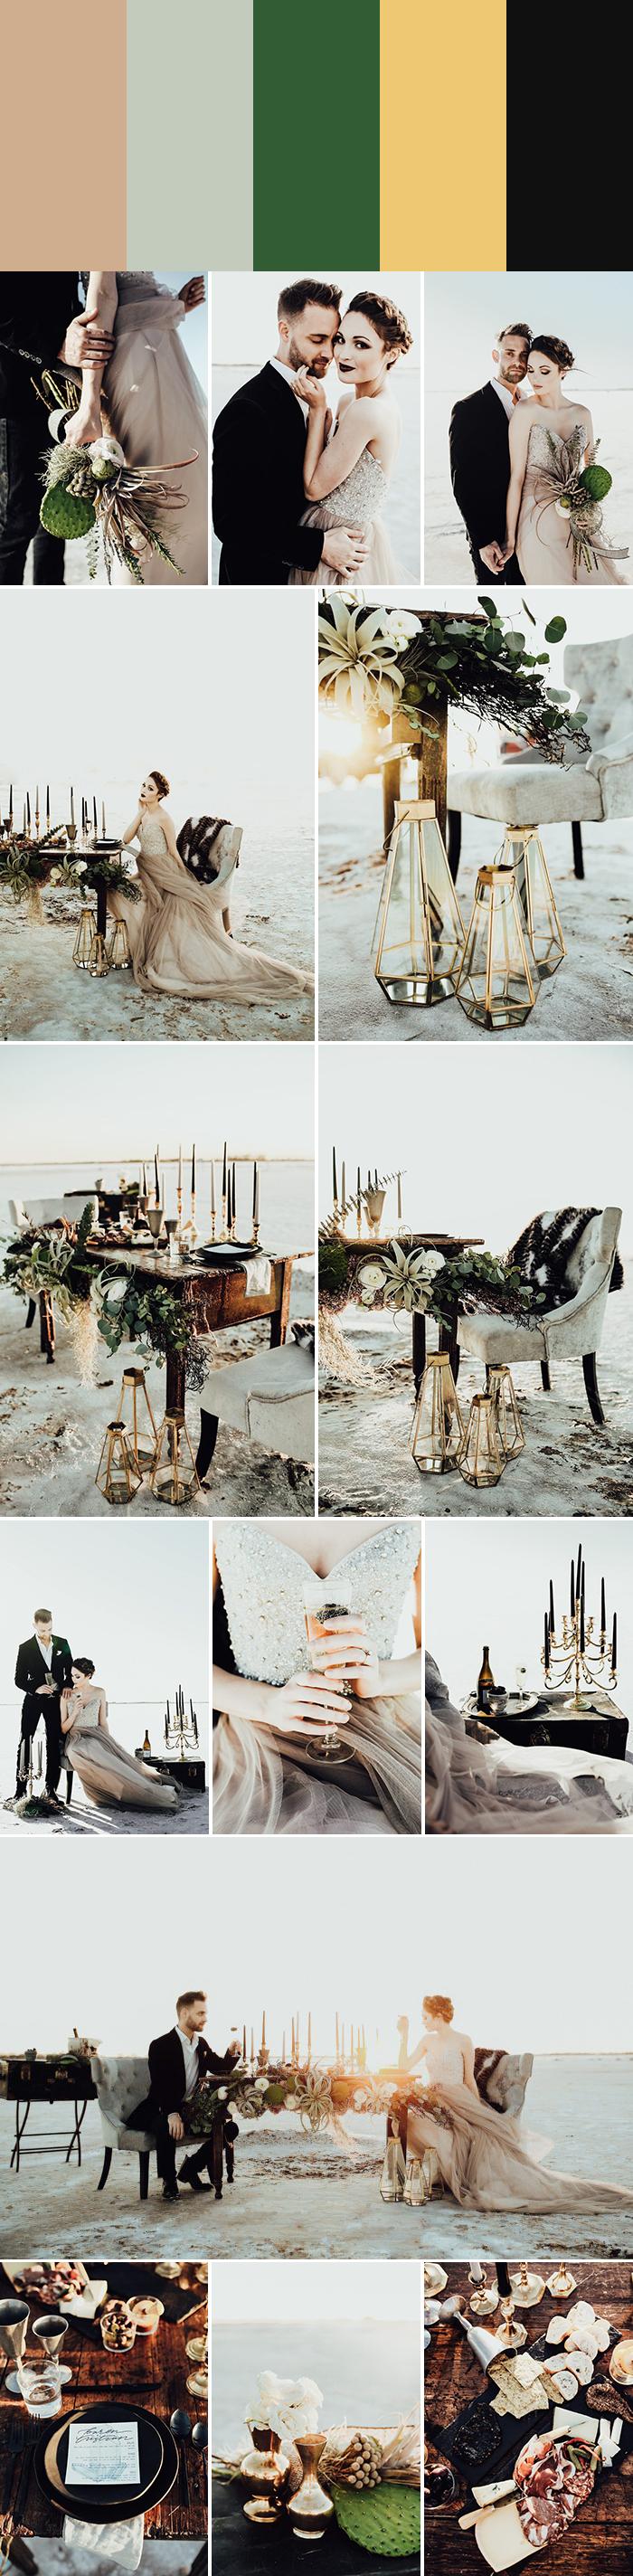 5 Palette Ideas for Winter Wedding Colors | Junebug Weddings